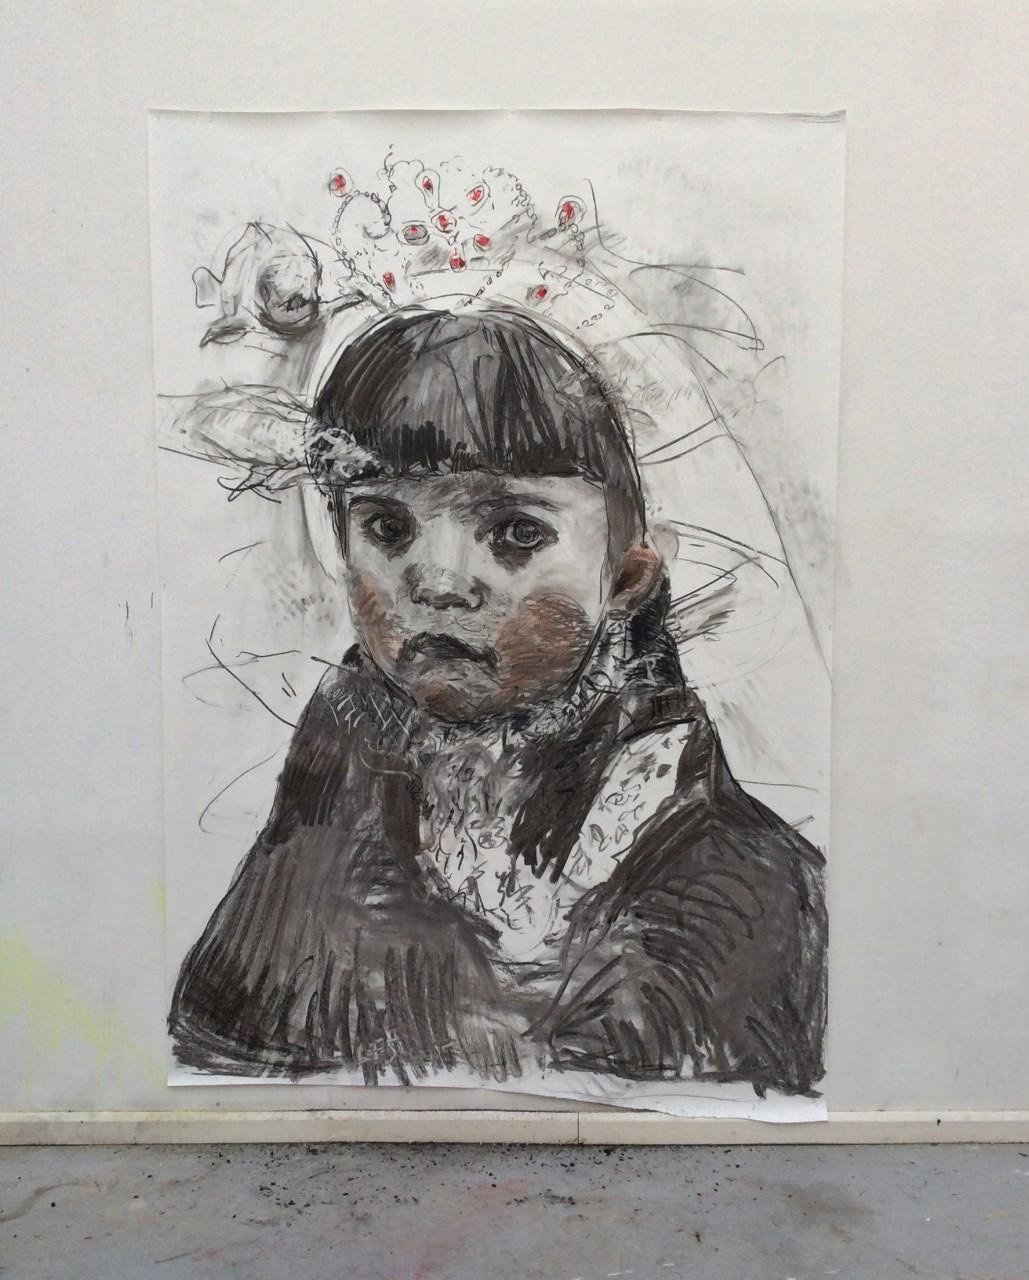 exposition-galerie-julio-gonzalez-laurent-esquerre-10